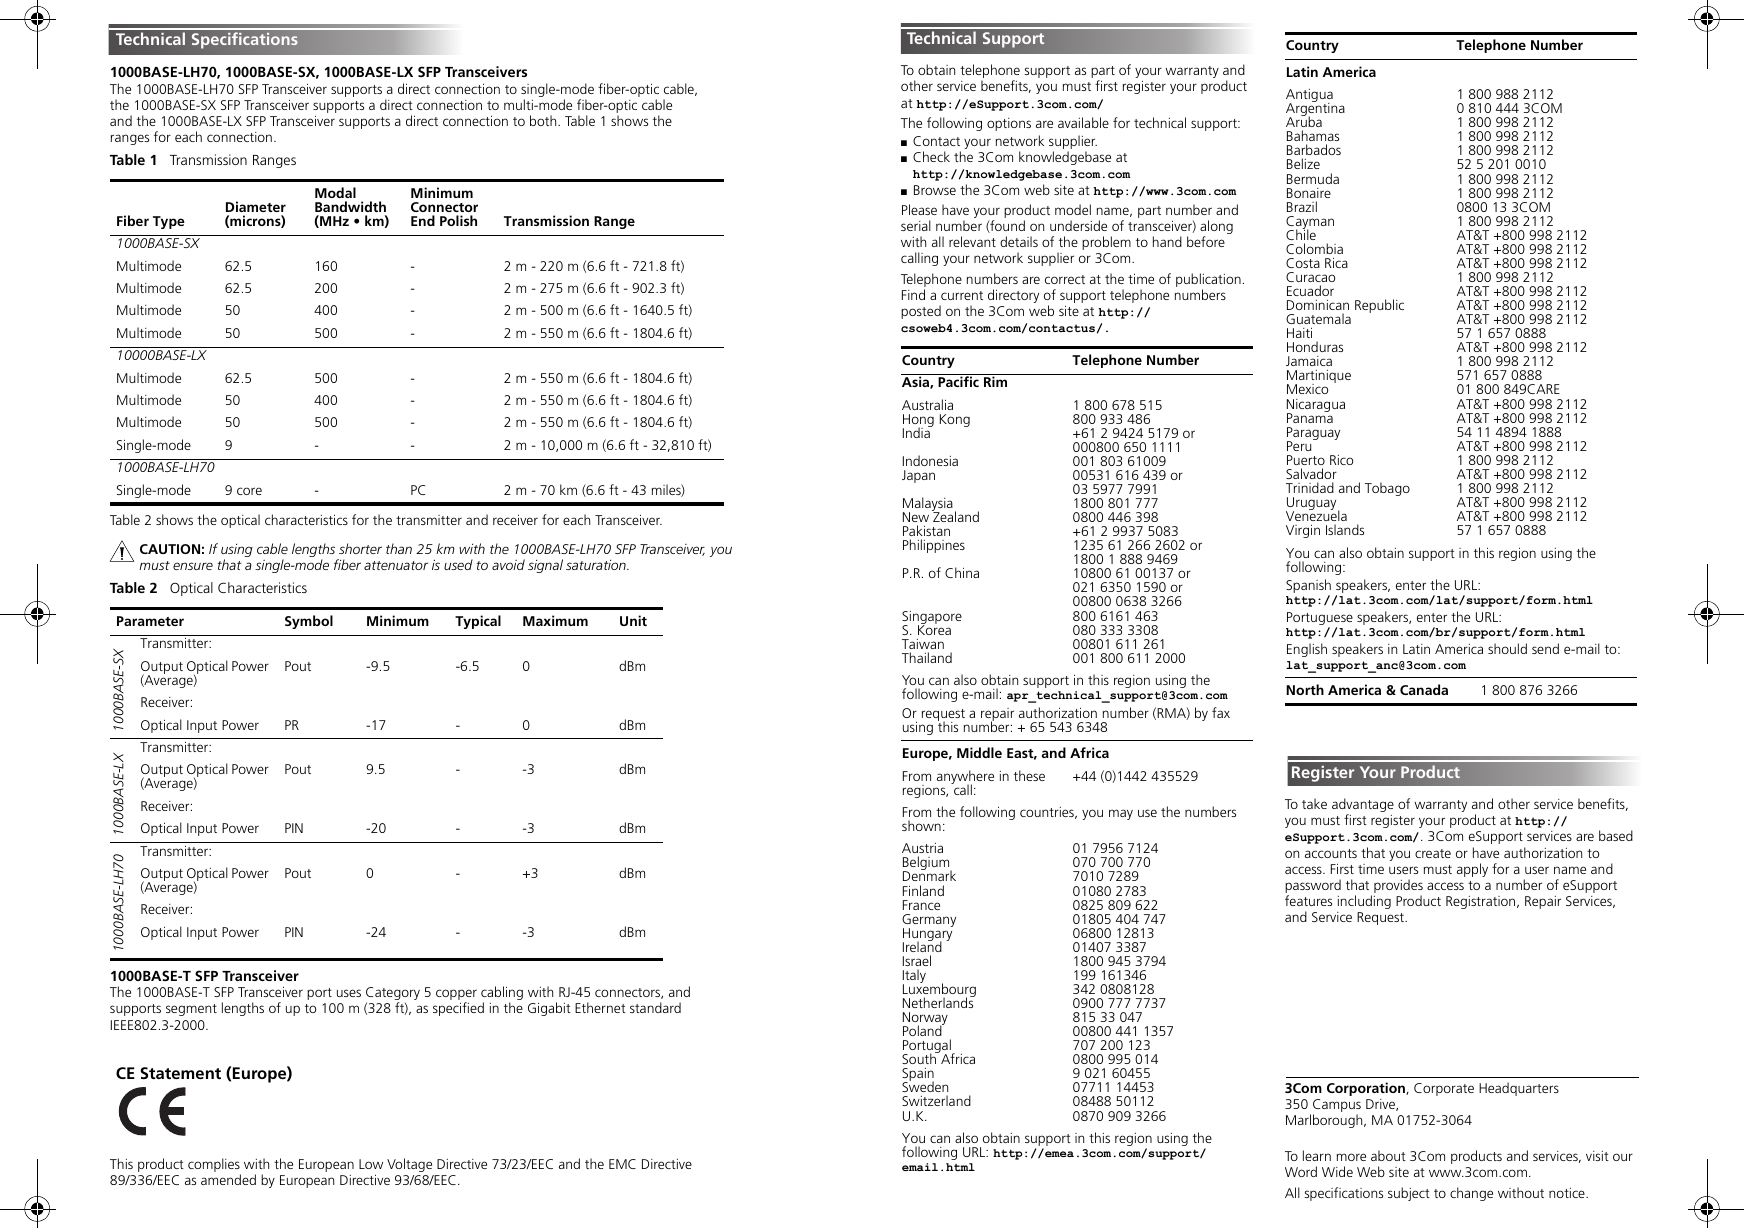 3Com 1000BASE SX (3CSFP91) User Manual To The 7b258503 d630